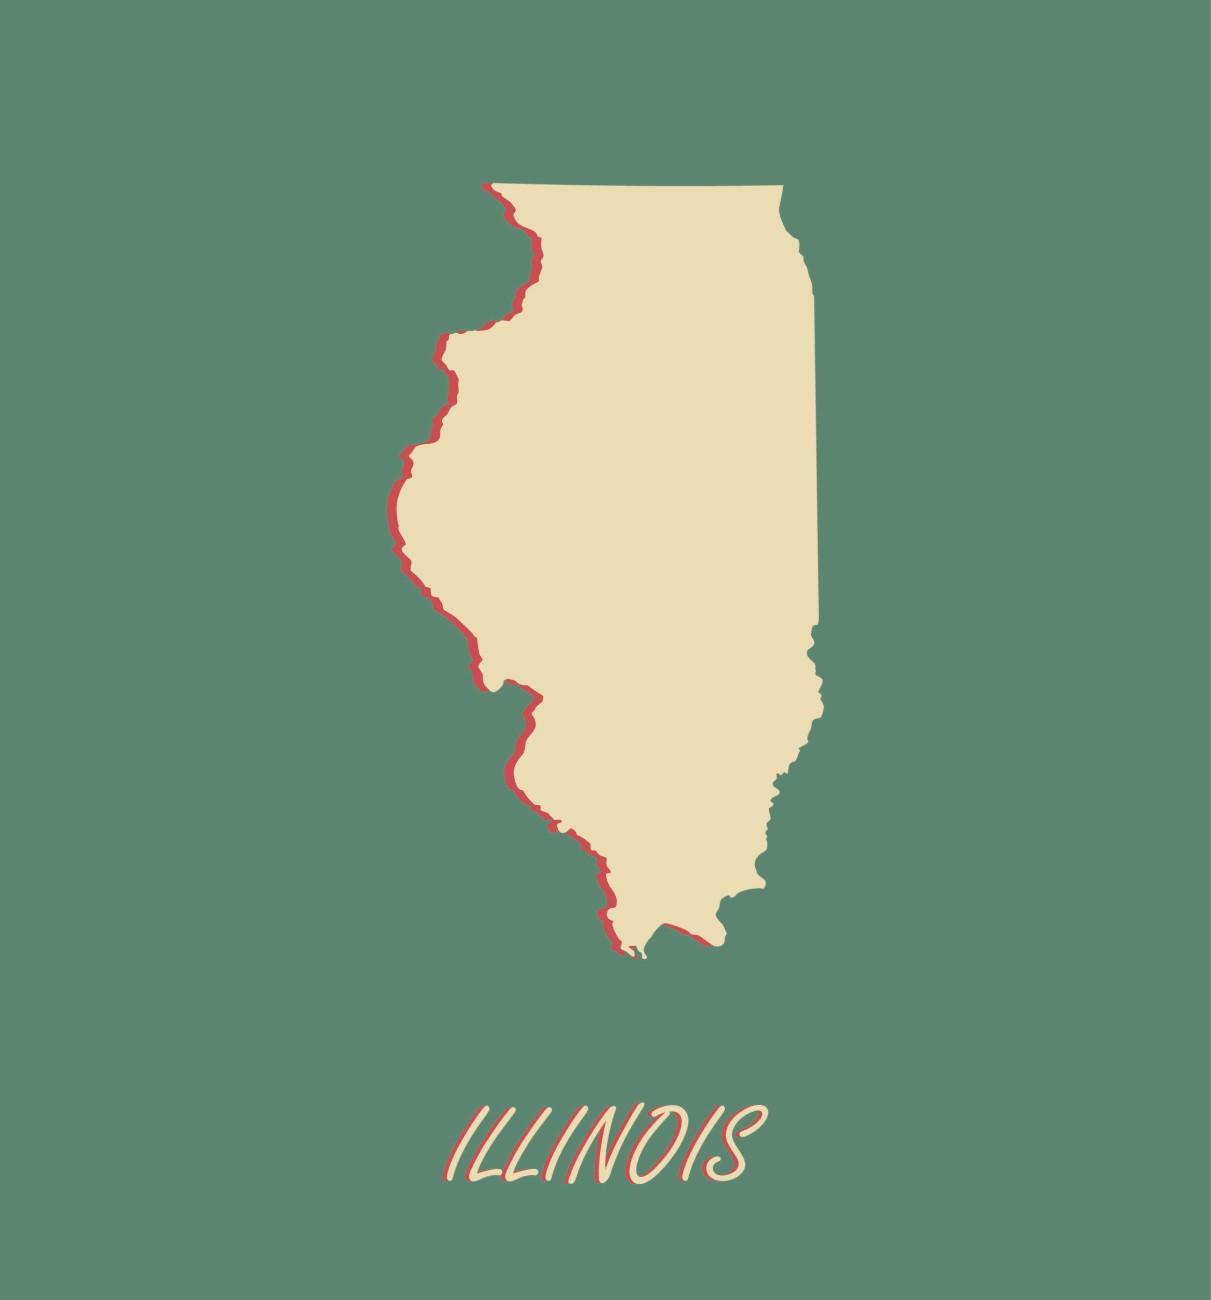 Illinois Tax & Labor Law Summary - Care com HomePay